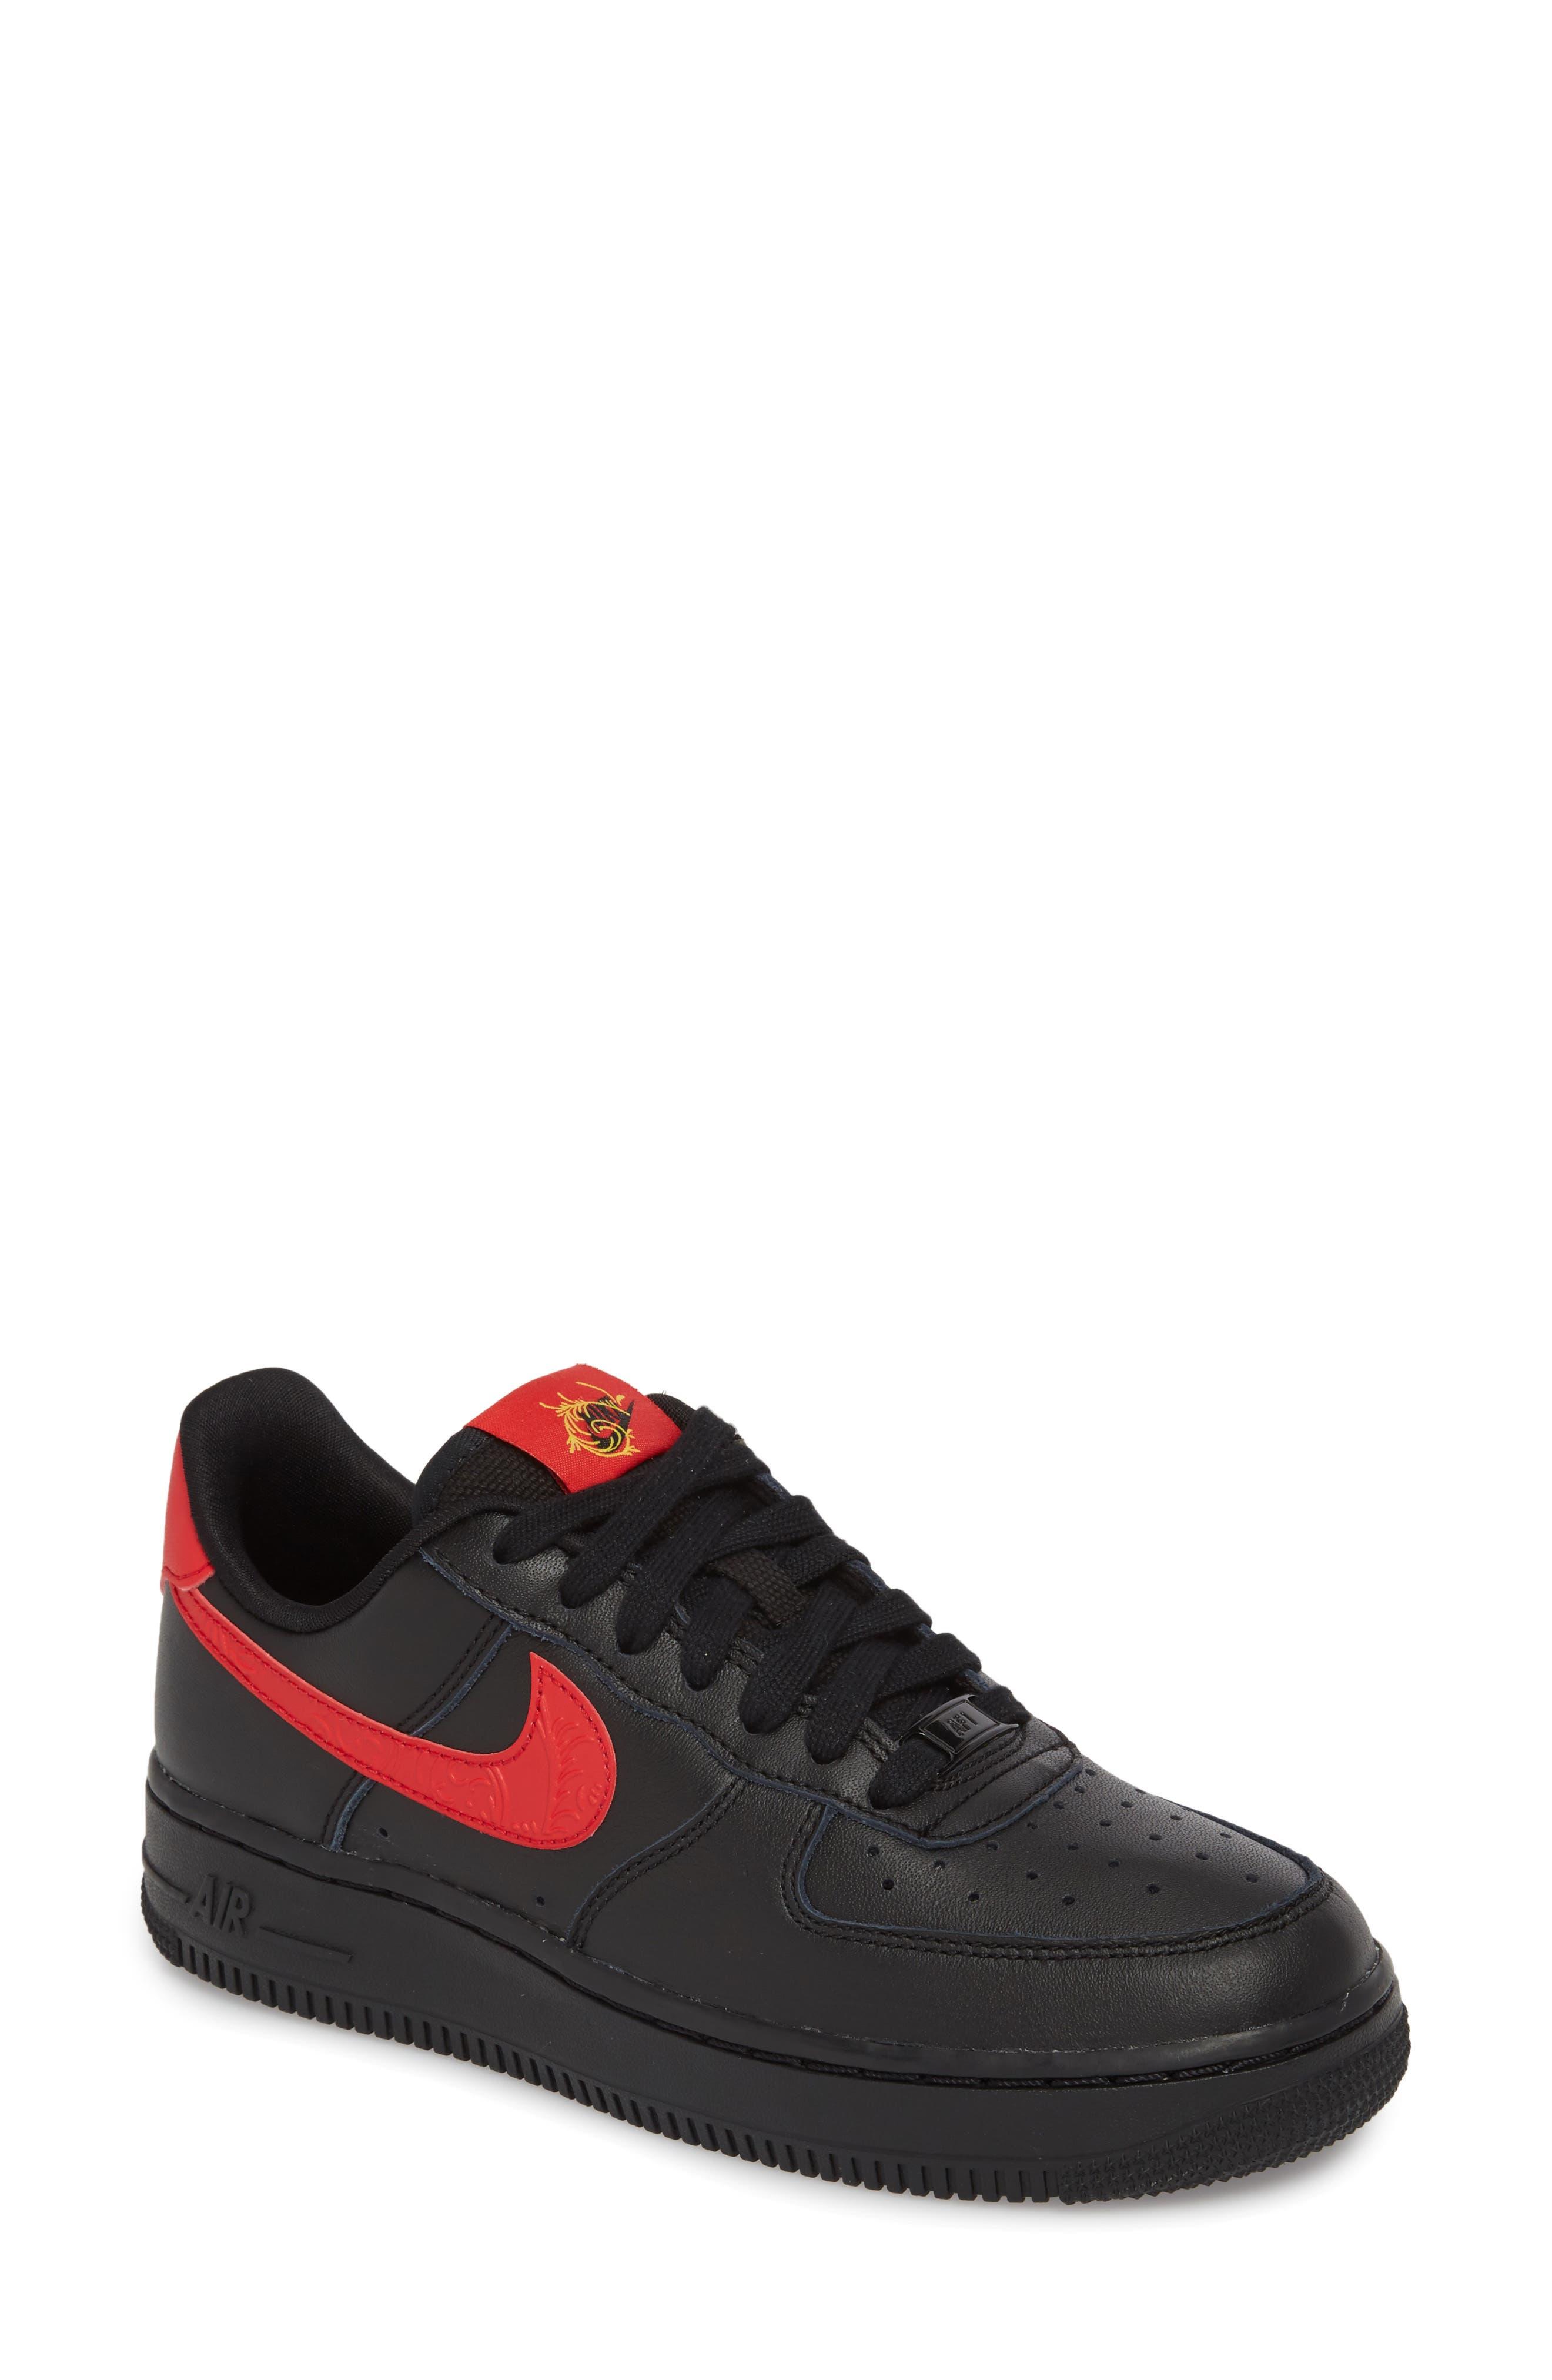 Air Force 1 '07 Sneaker,                             Main thumbnail 1, color,                             Black/ University Red